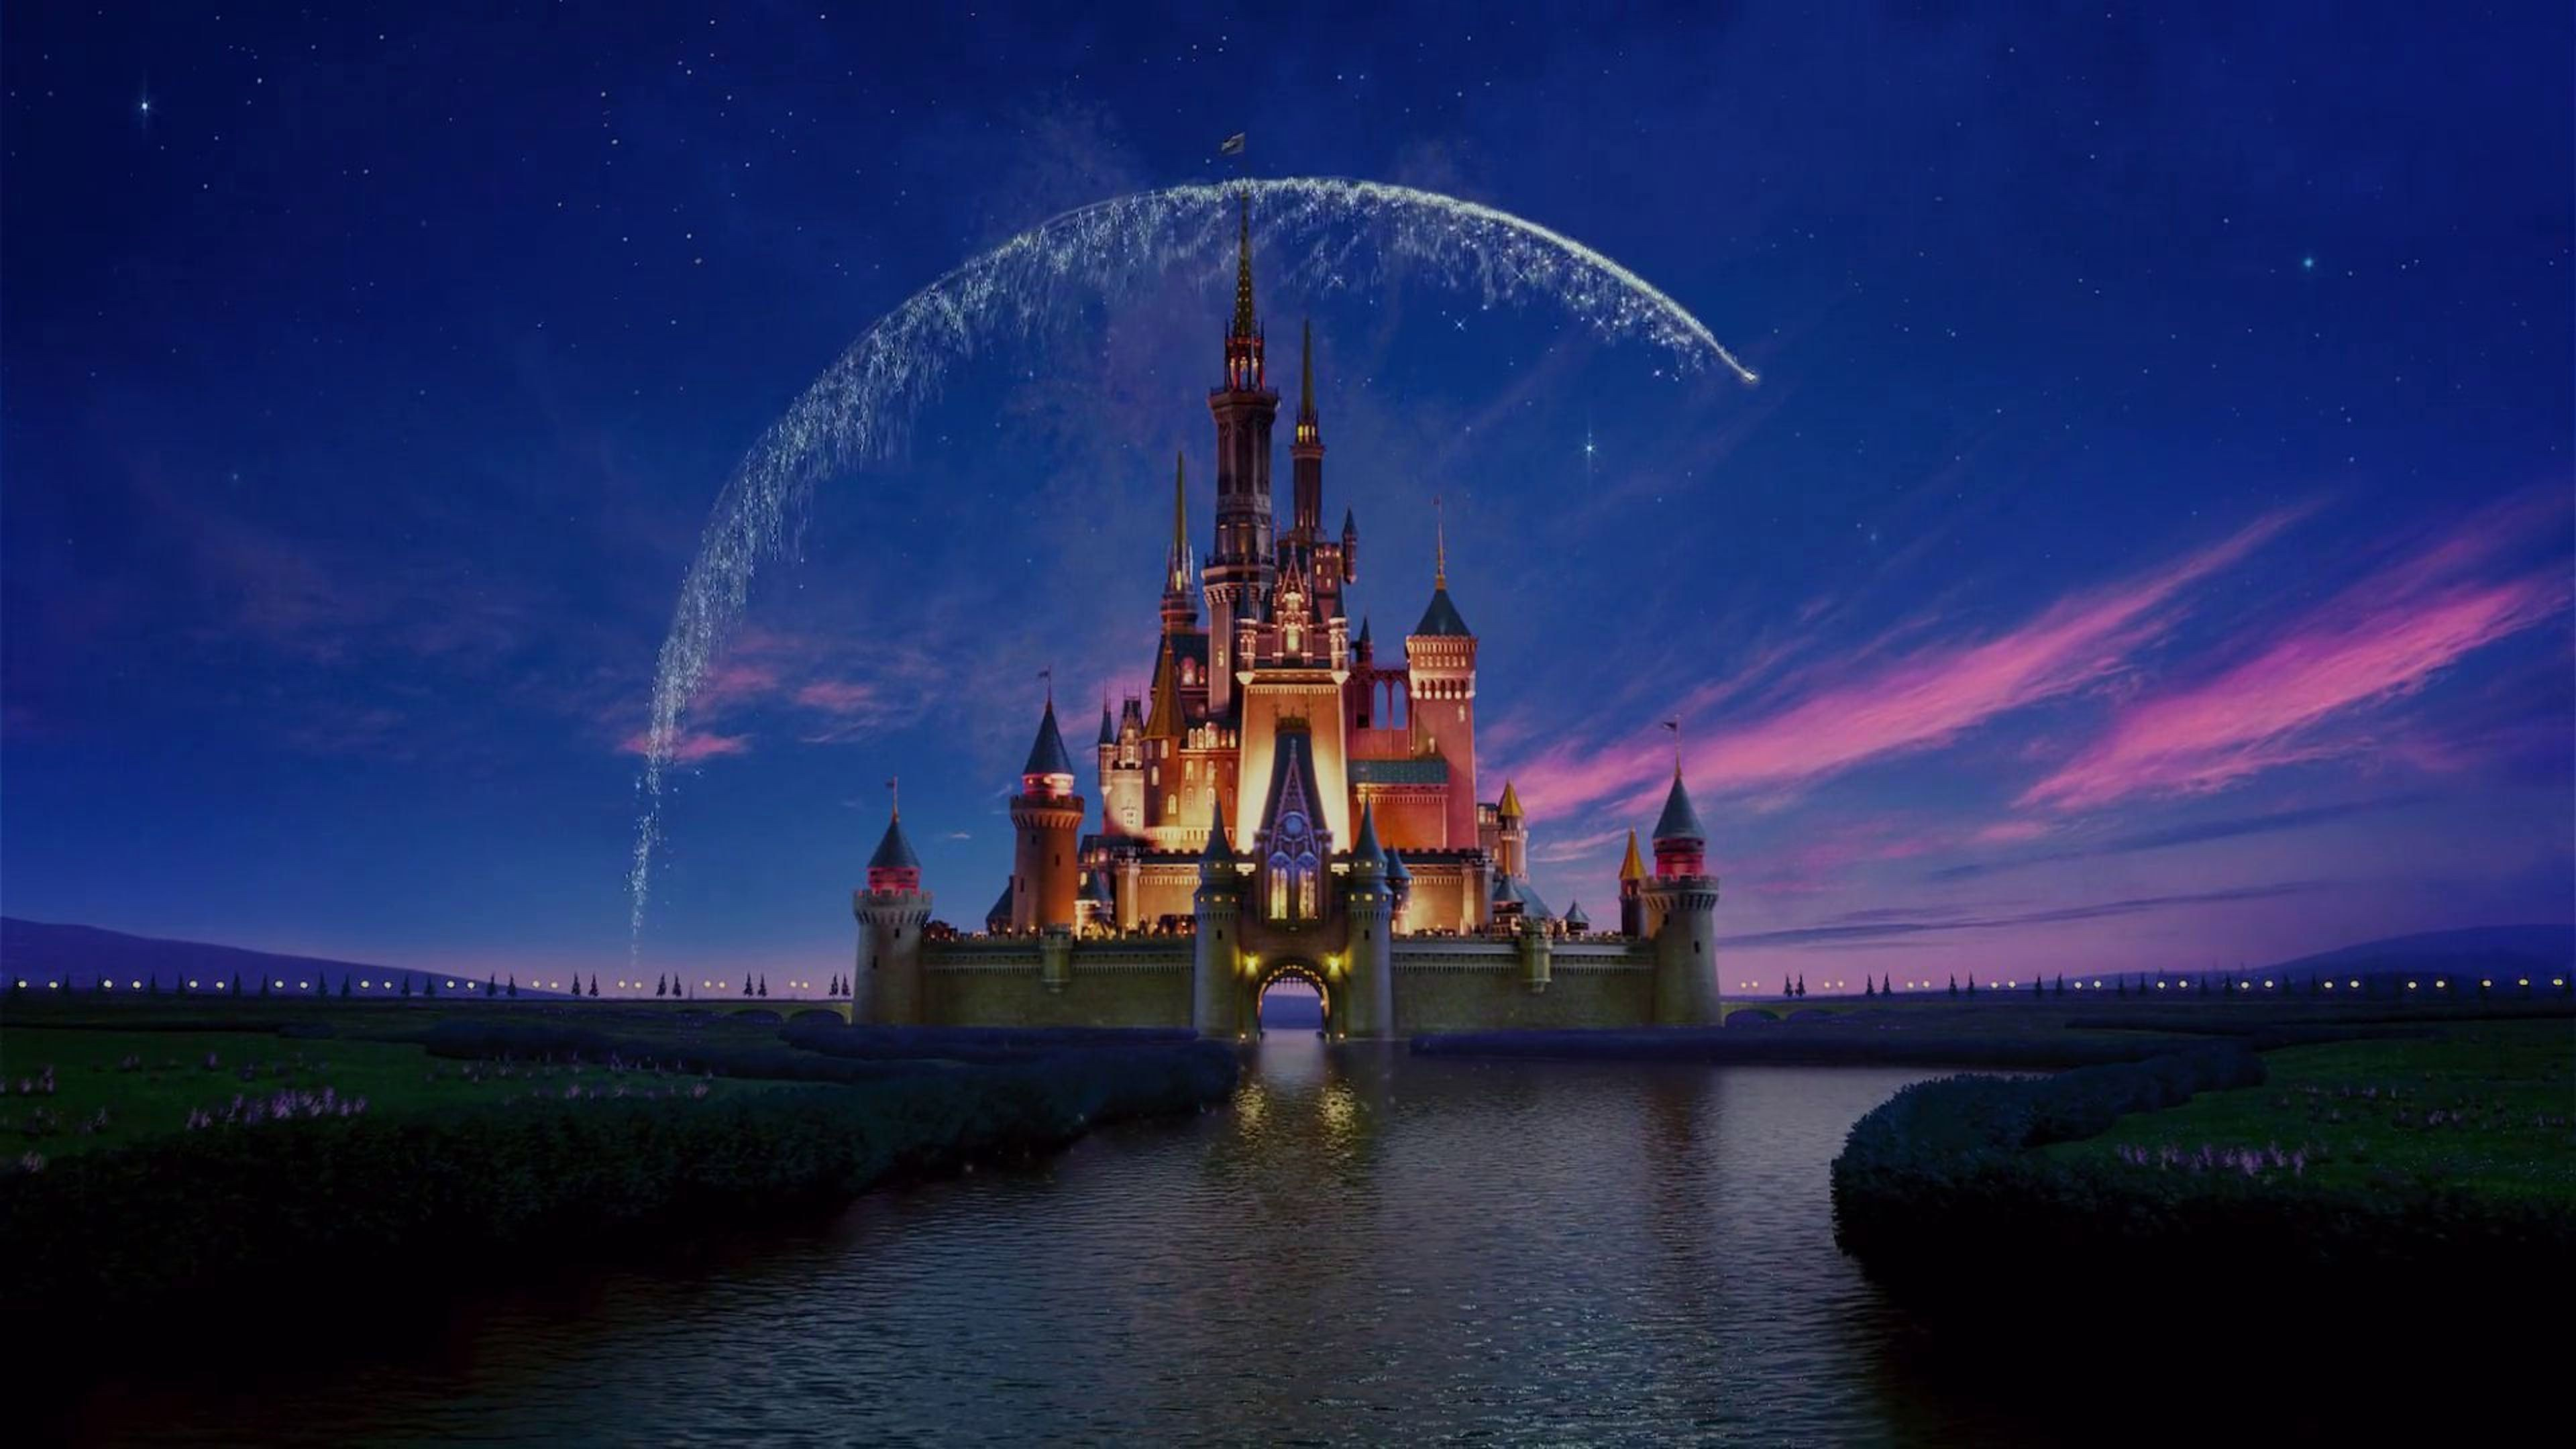 HD Disney World Background HD Desktop Wallpapers 1080p Windows 3840x2160